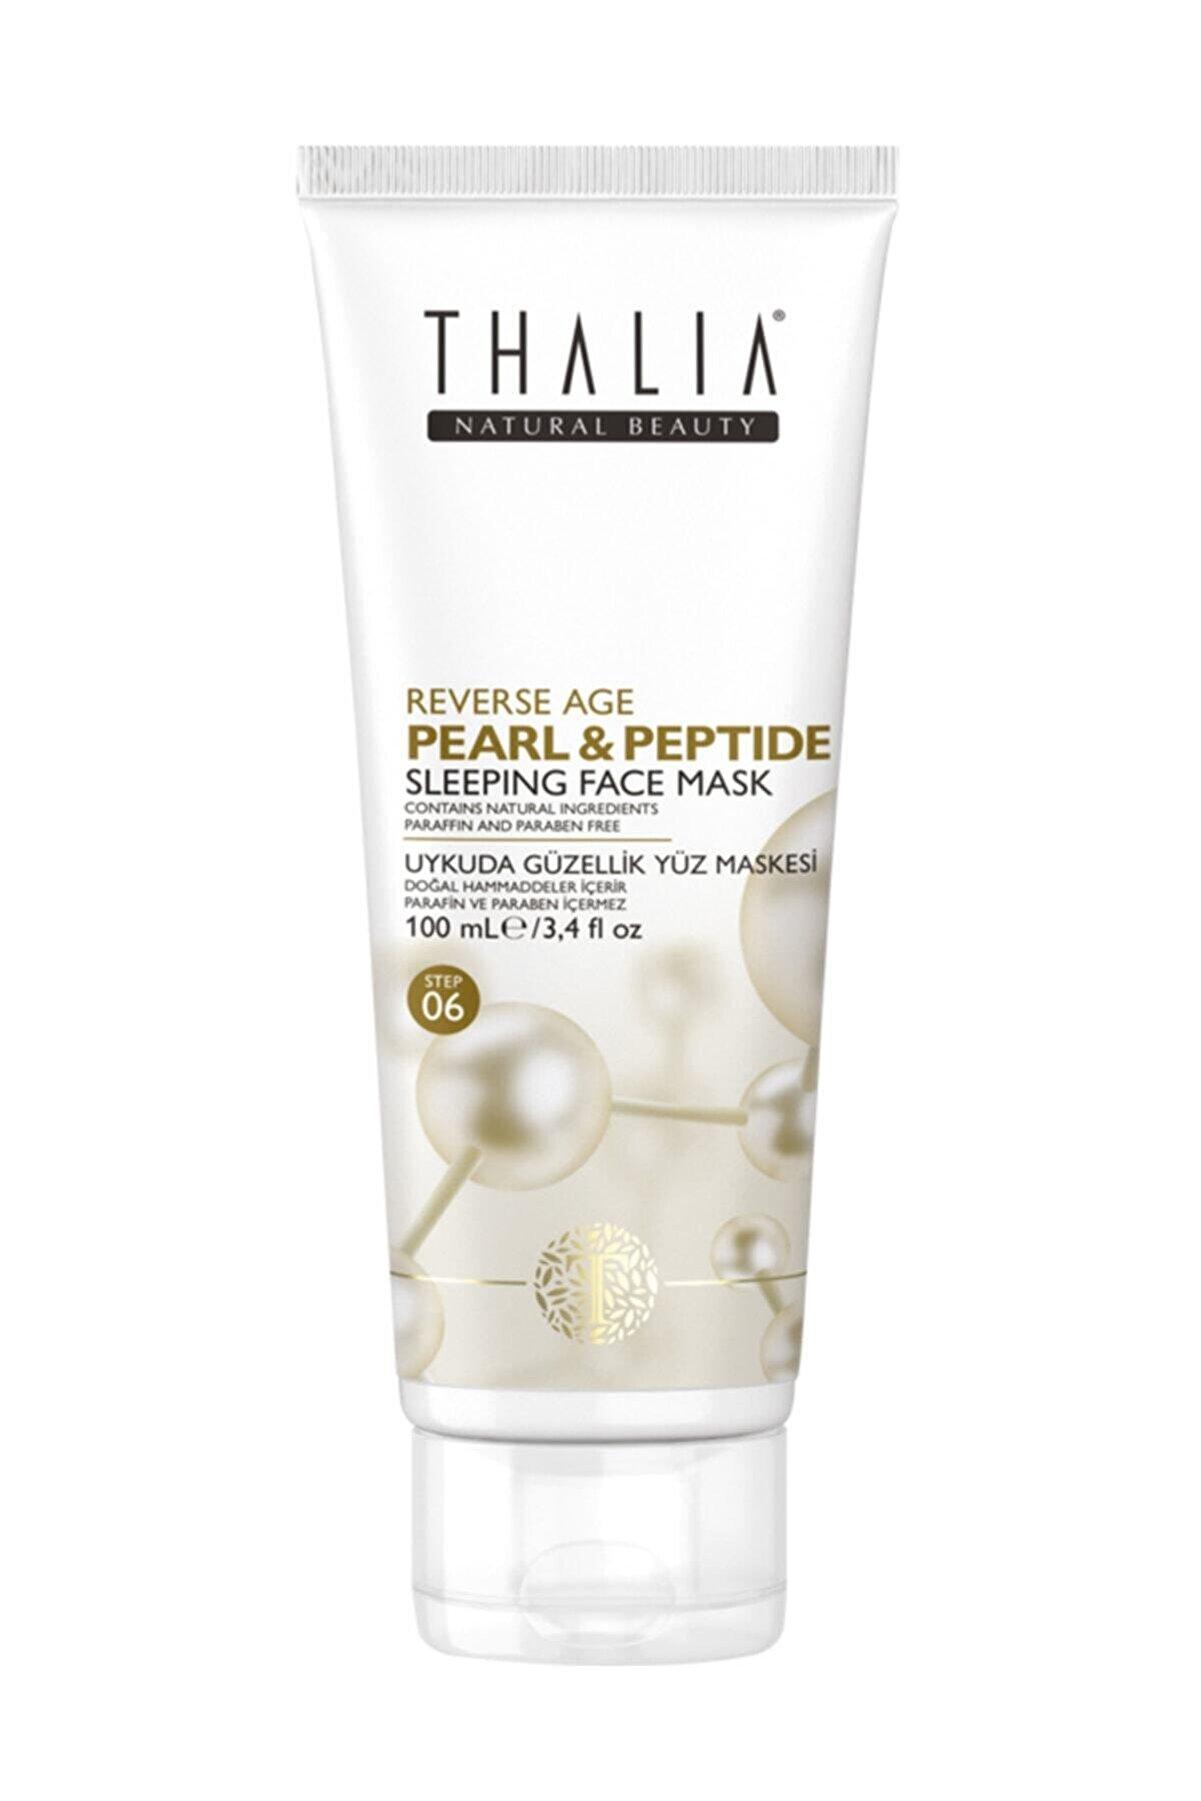 Thalia Natural Beauty Pearl & Peptide Reverse Age Serisi Yaşlanma Karşıtı Uykuda Güzellik Maskesi - 100 ml